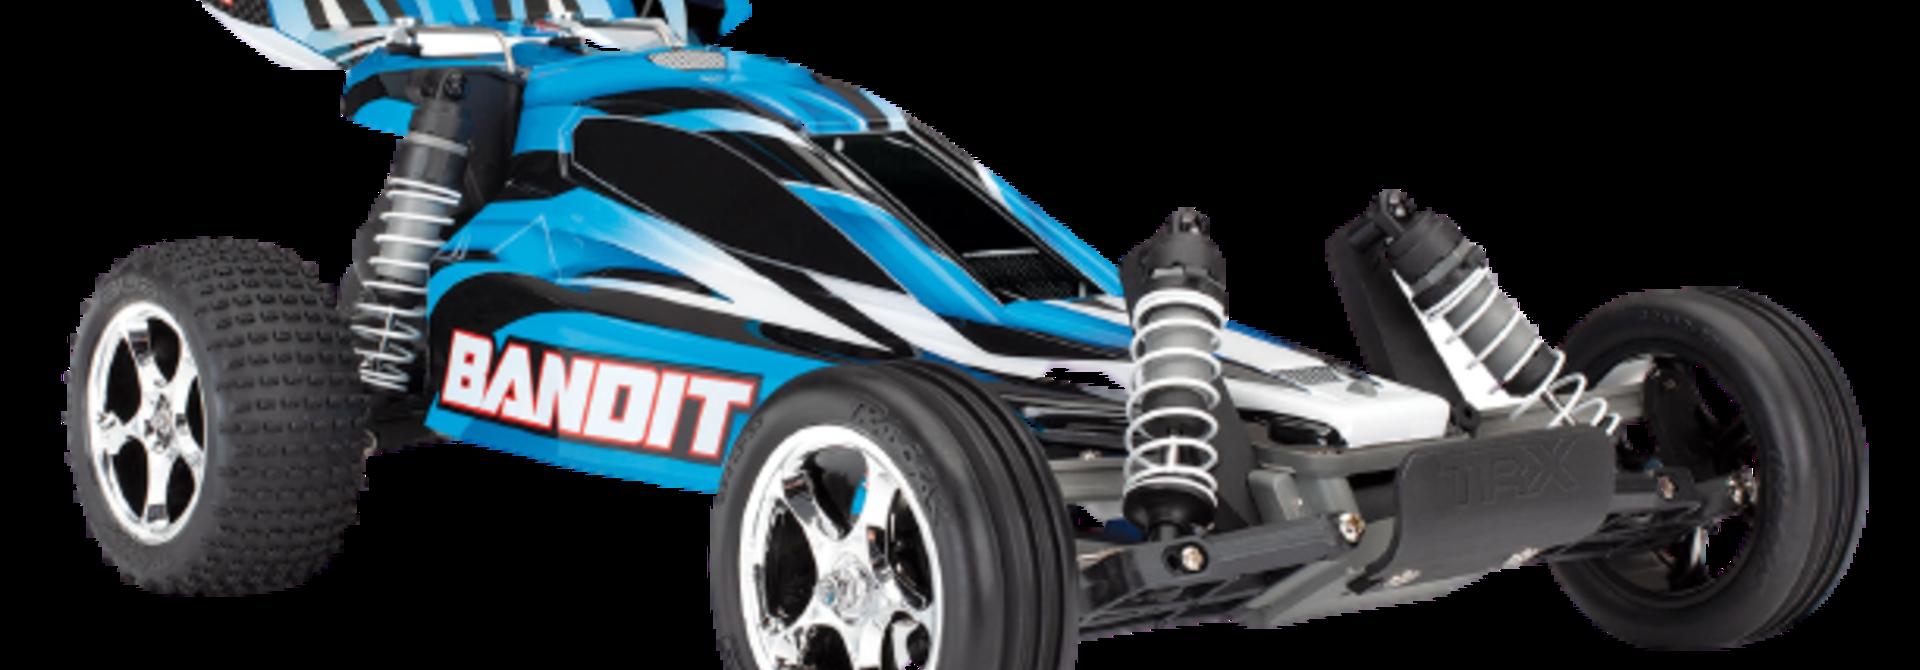 Traxxas Bandit XL-5 TQ (incl. Accu / oplader), Blauw, TRX24054-1B